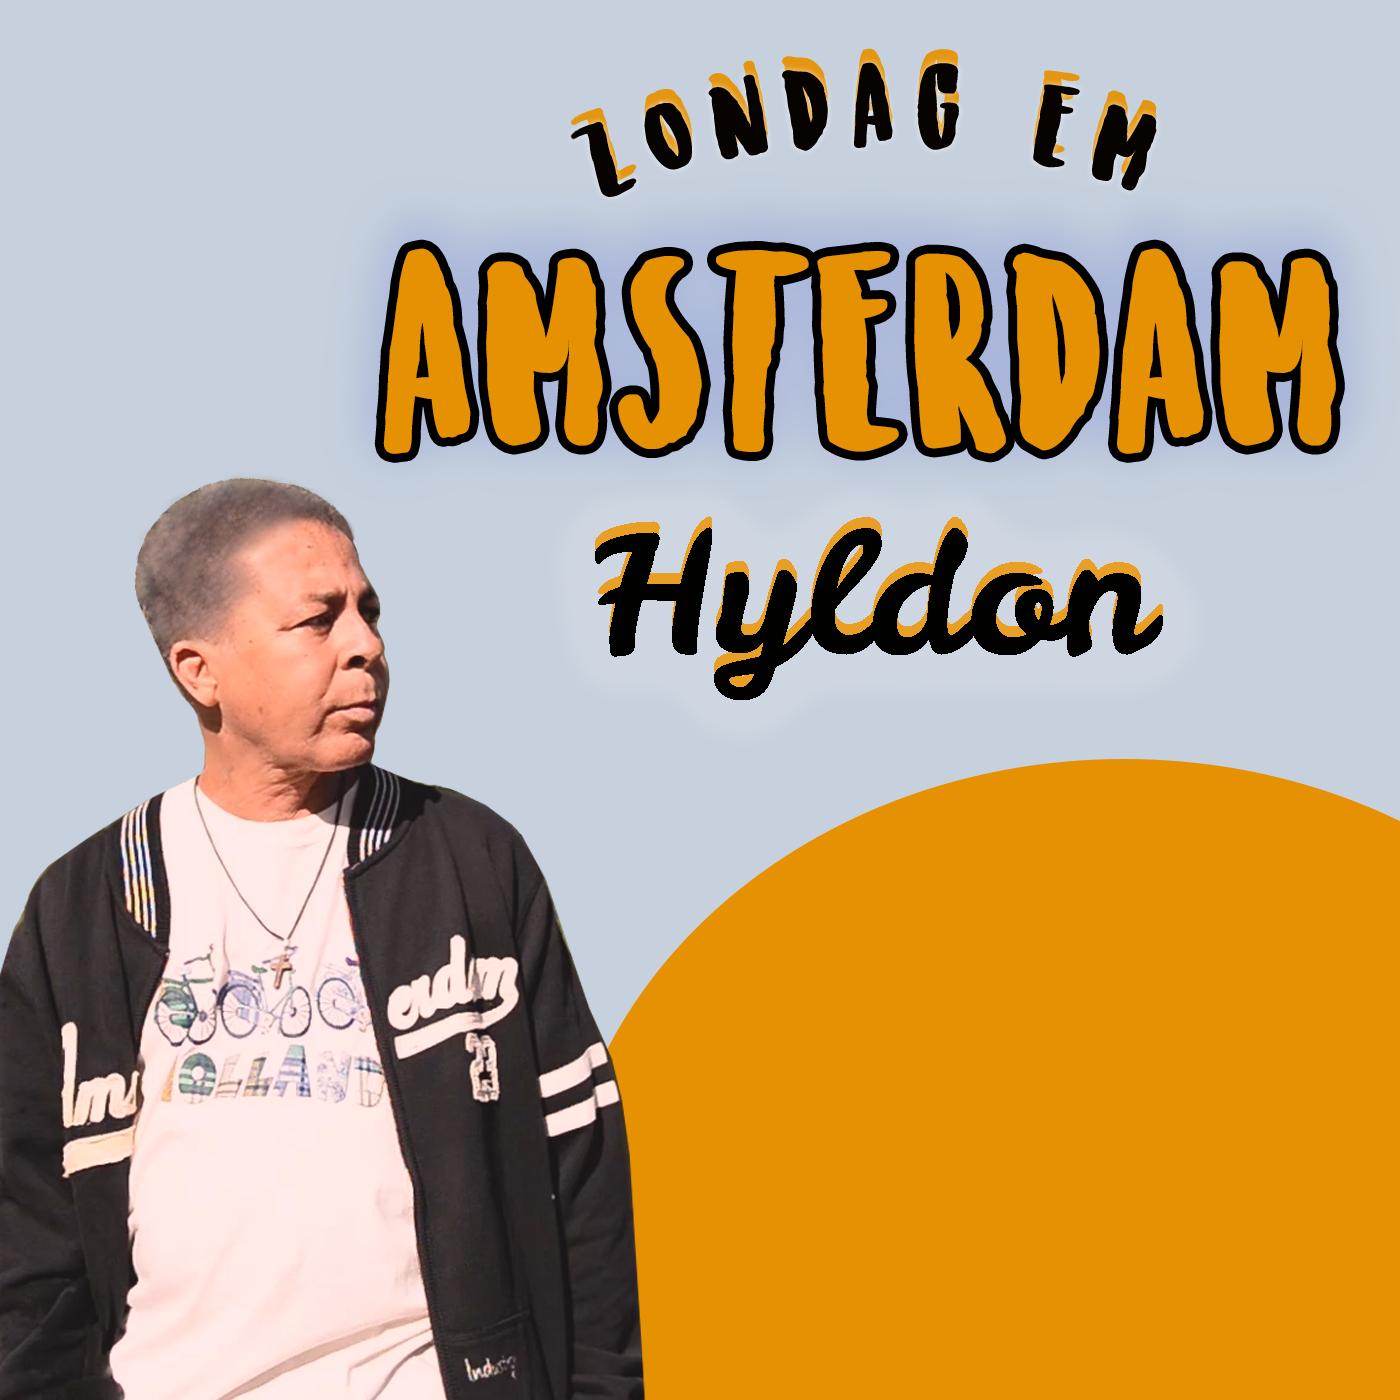 capa-digital-hyldon-zondag-em-amsterdam